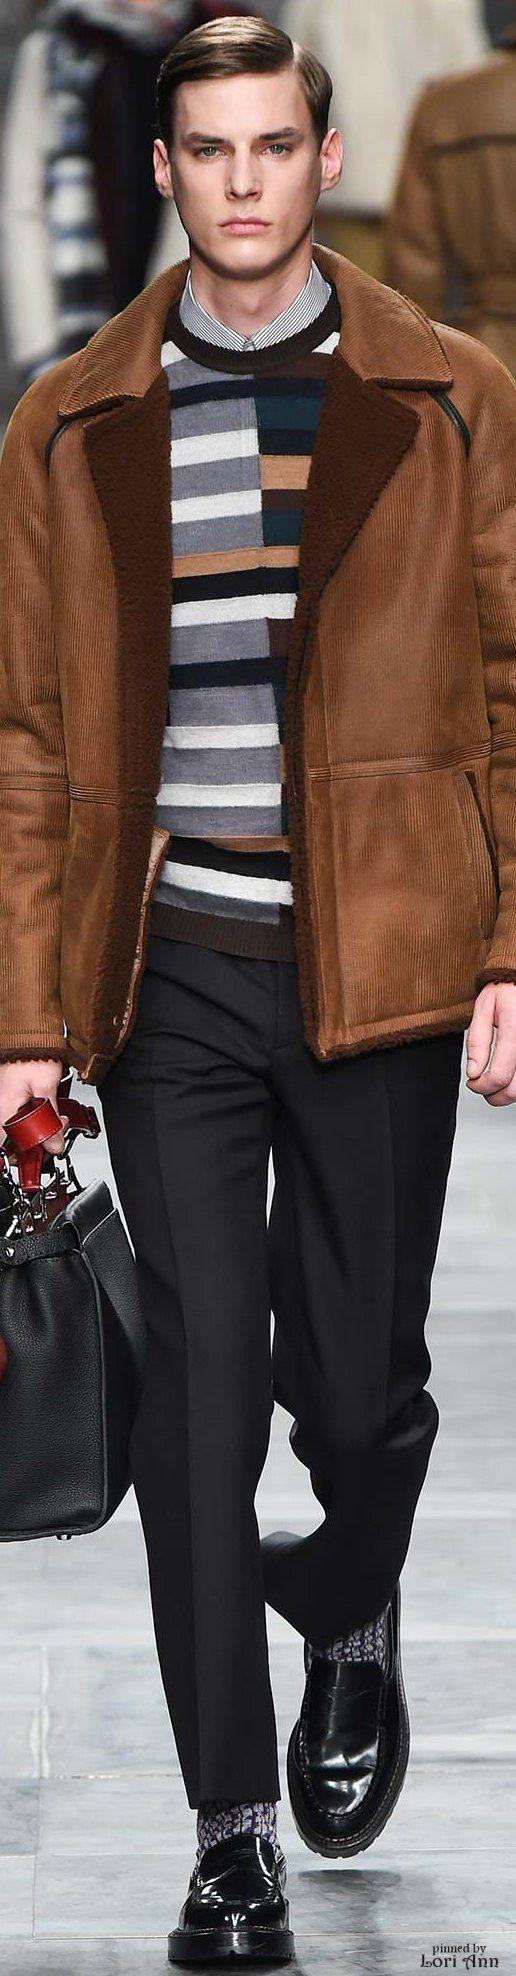 Fendi 2015 | Menswear | Men's Fashion | Men's Outfit for Fall/Winter | Smart Casual | Moda Masculina | Shop at designerclothingfans.com